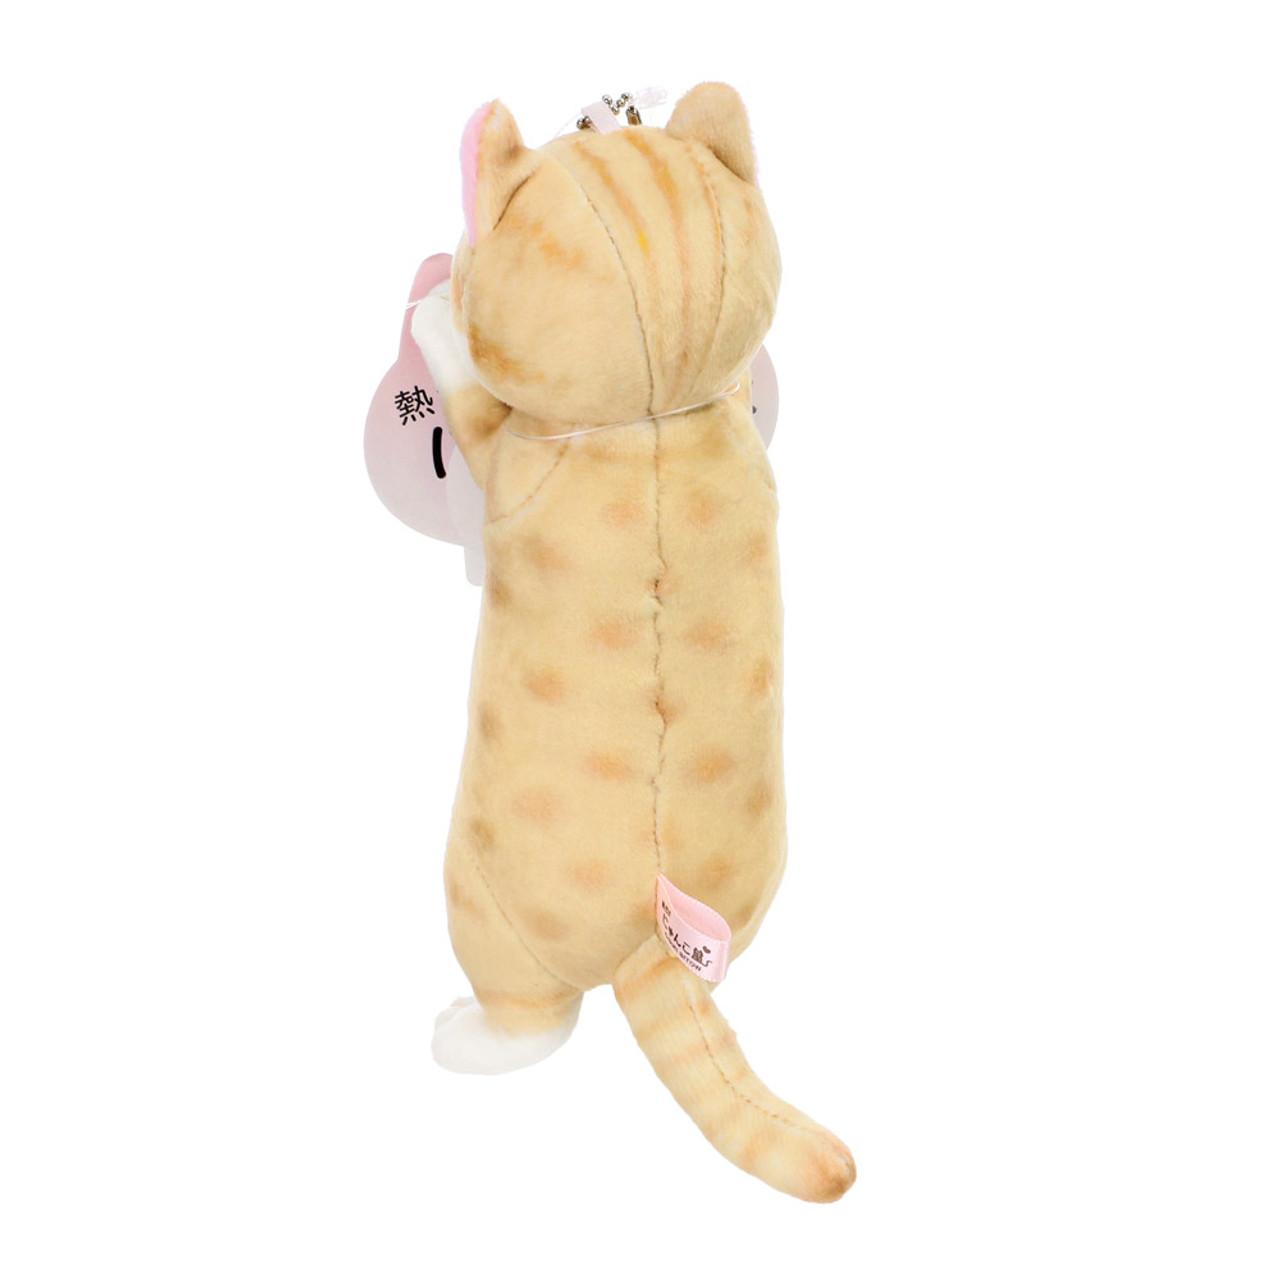 Japan Nyanko Shop Dots Pattern Cat Mascot Plush Doll Charms - Savannah Cat